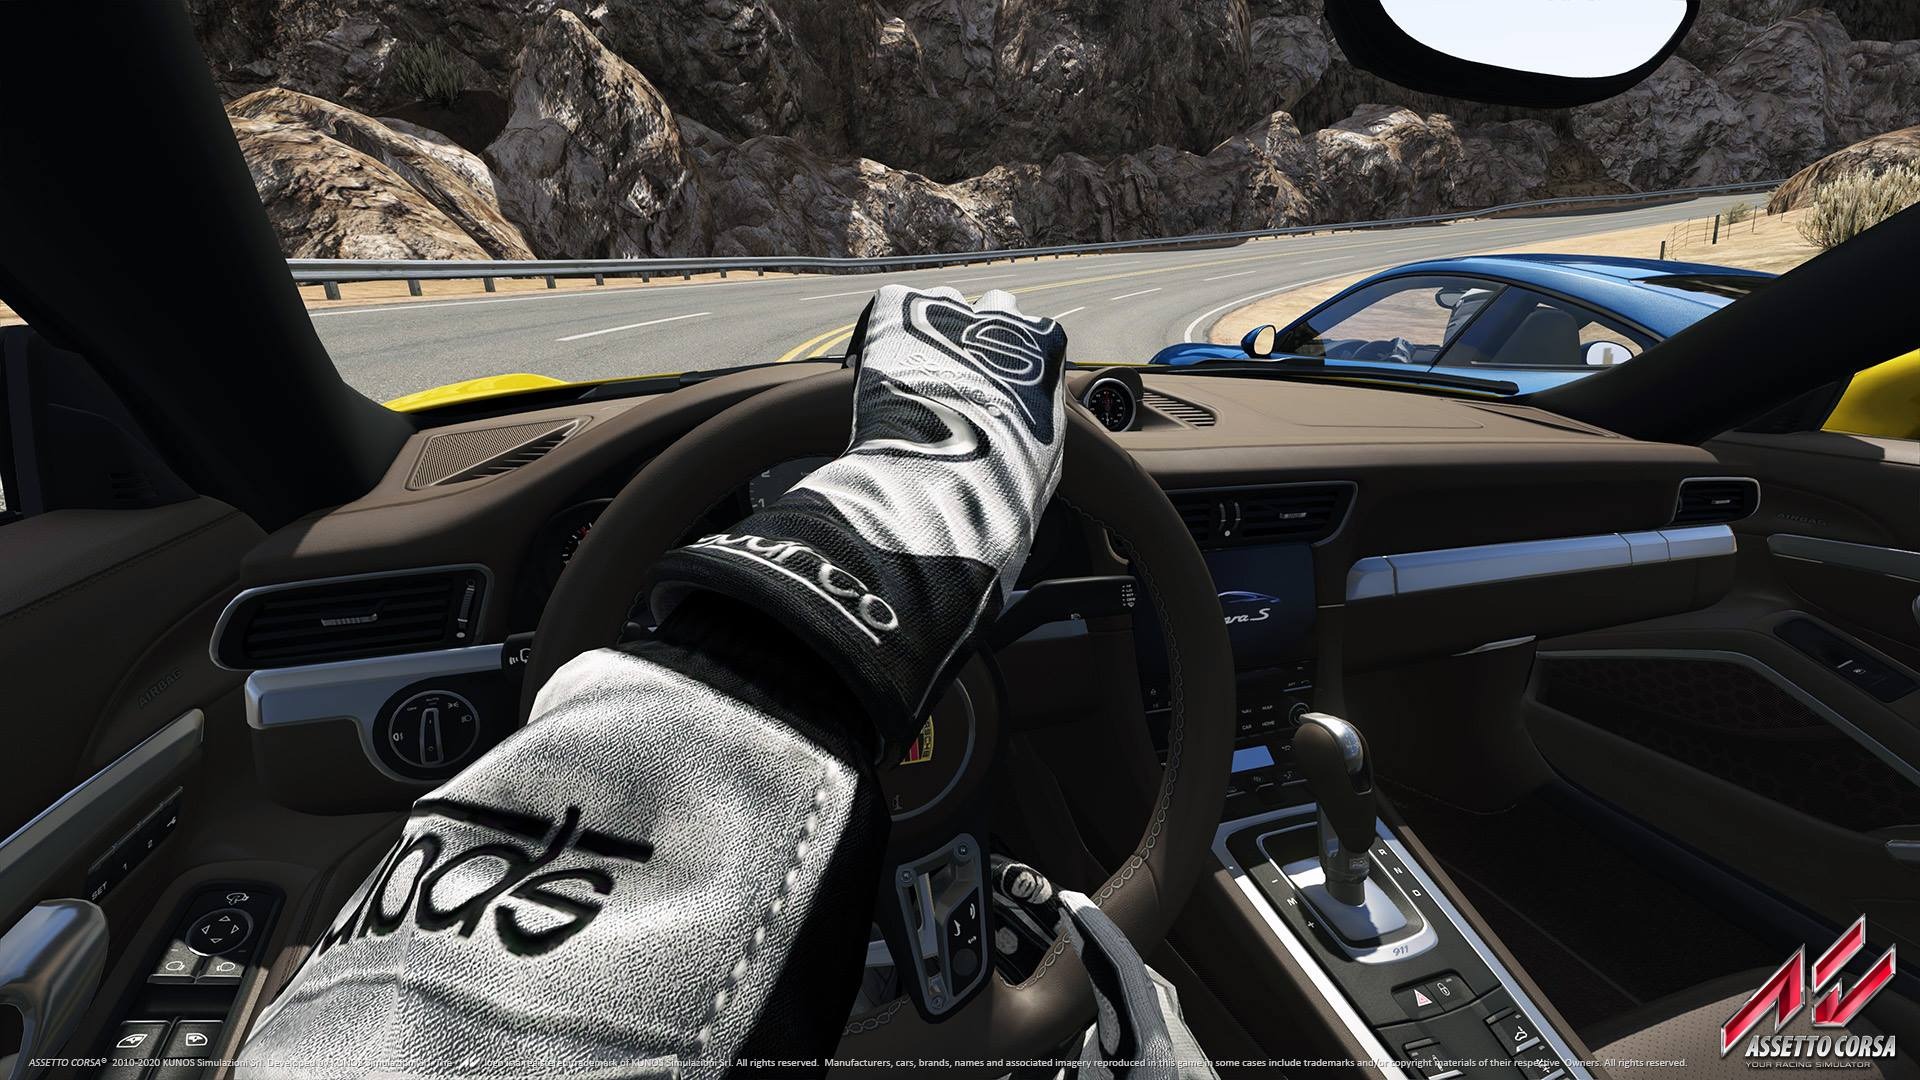 assetto corsa porsche preview images teased racedepartment. Black Bedroom Furniture Sets. Home Design Ideas